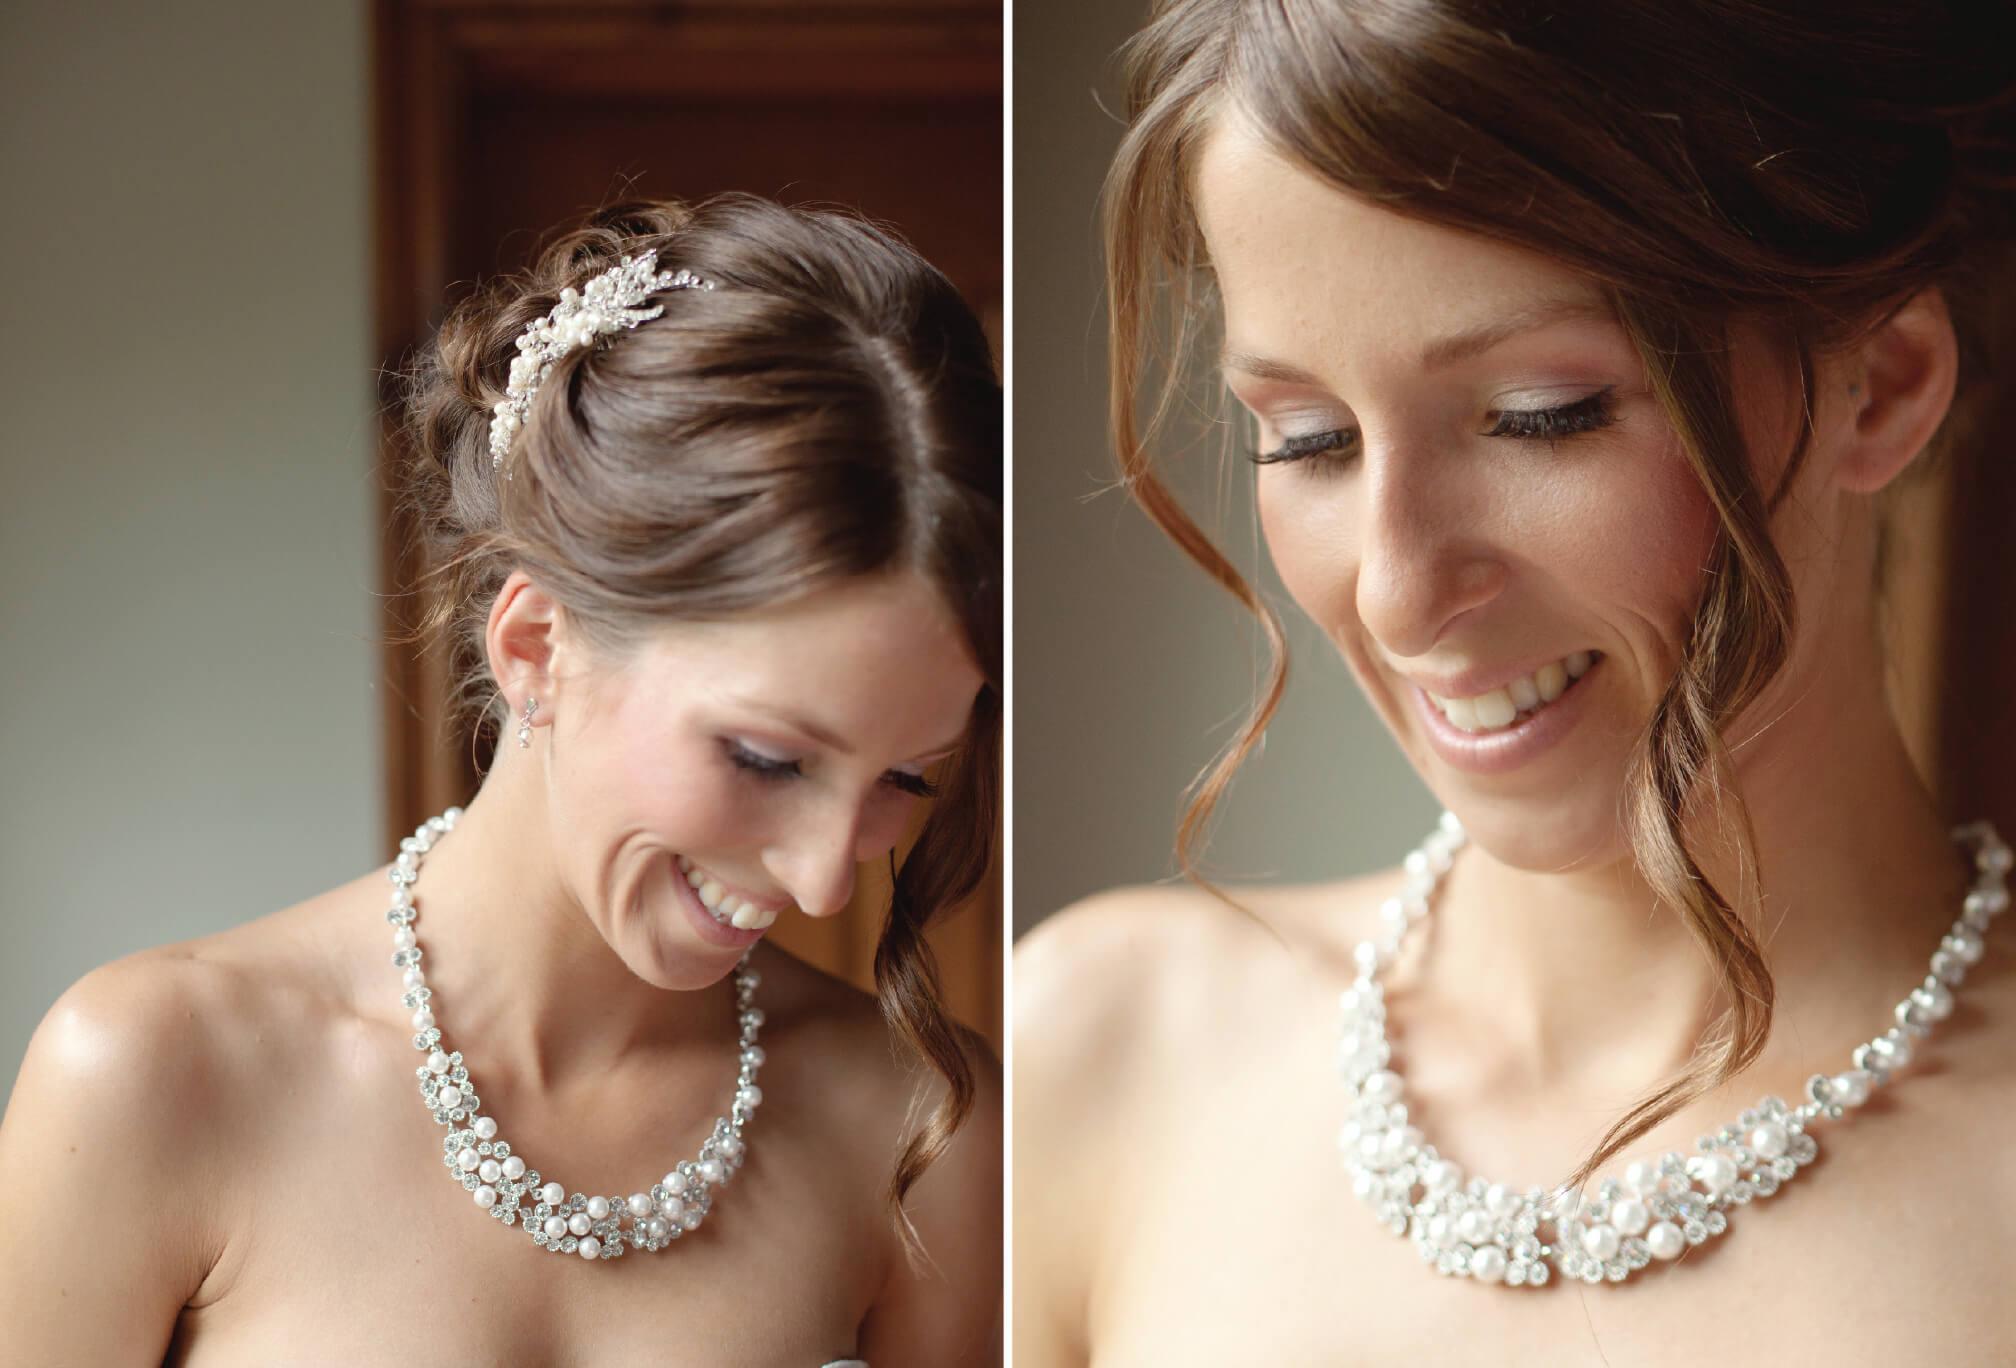 collingwood bride style